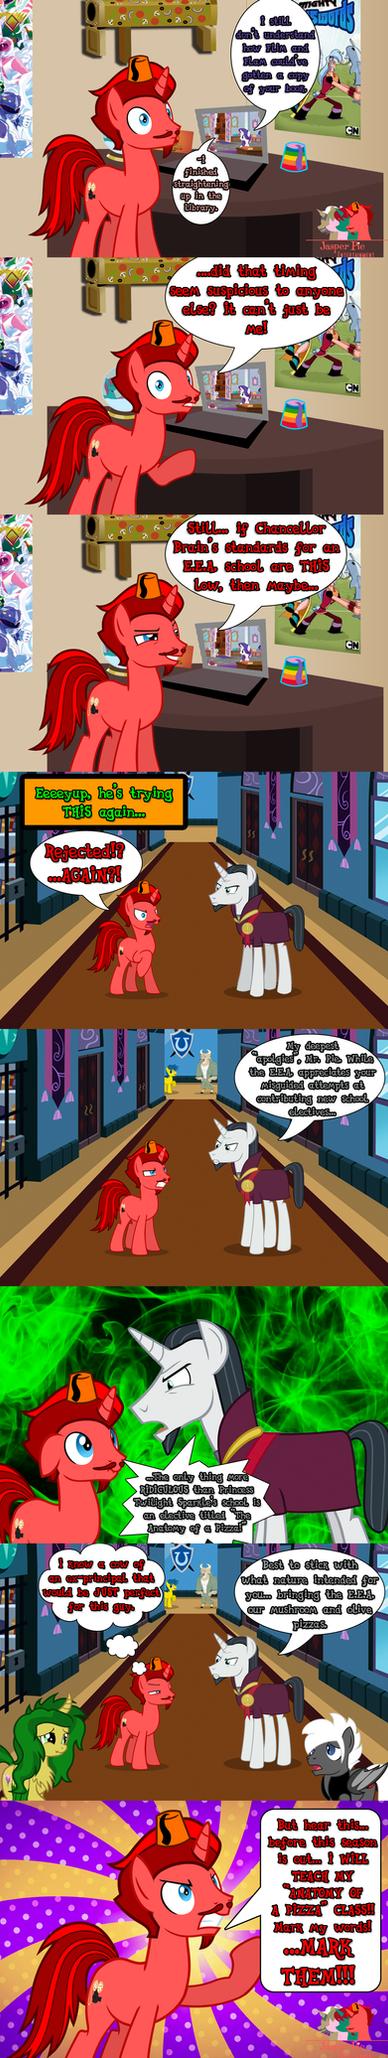 Jasper Reacts to Friendship University (SPOILERS!) by JasperPie